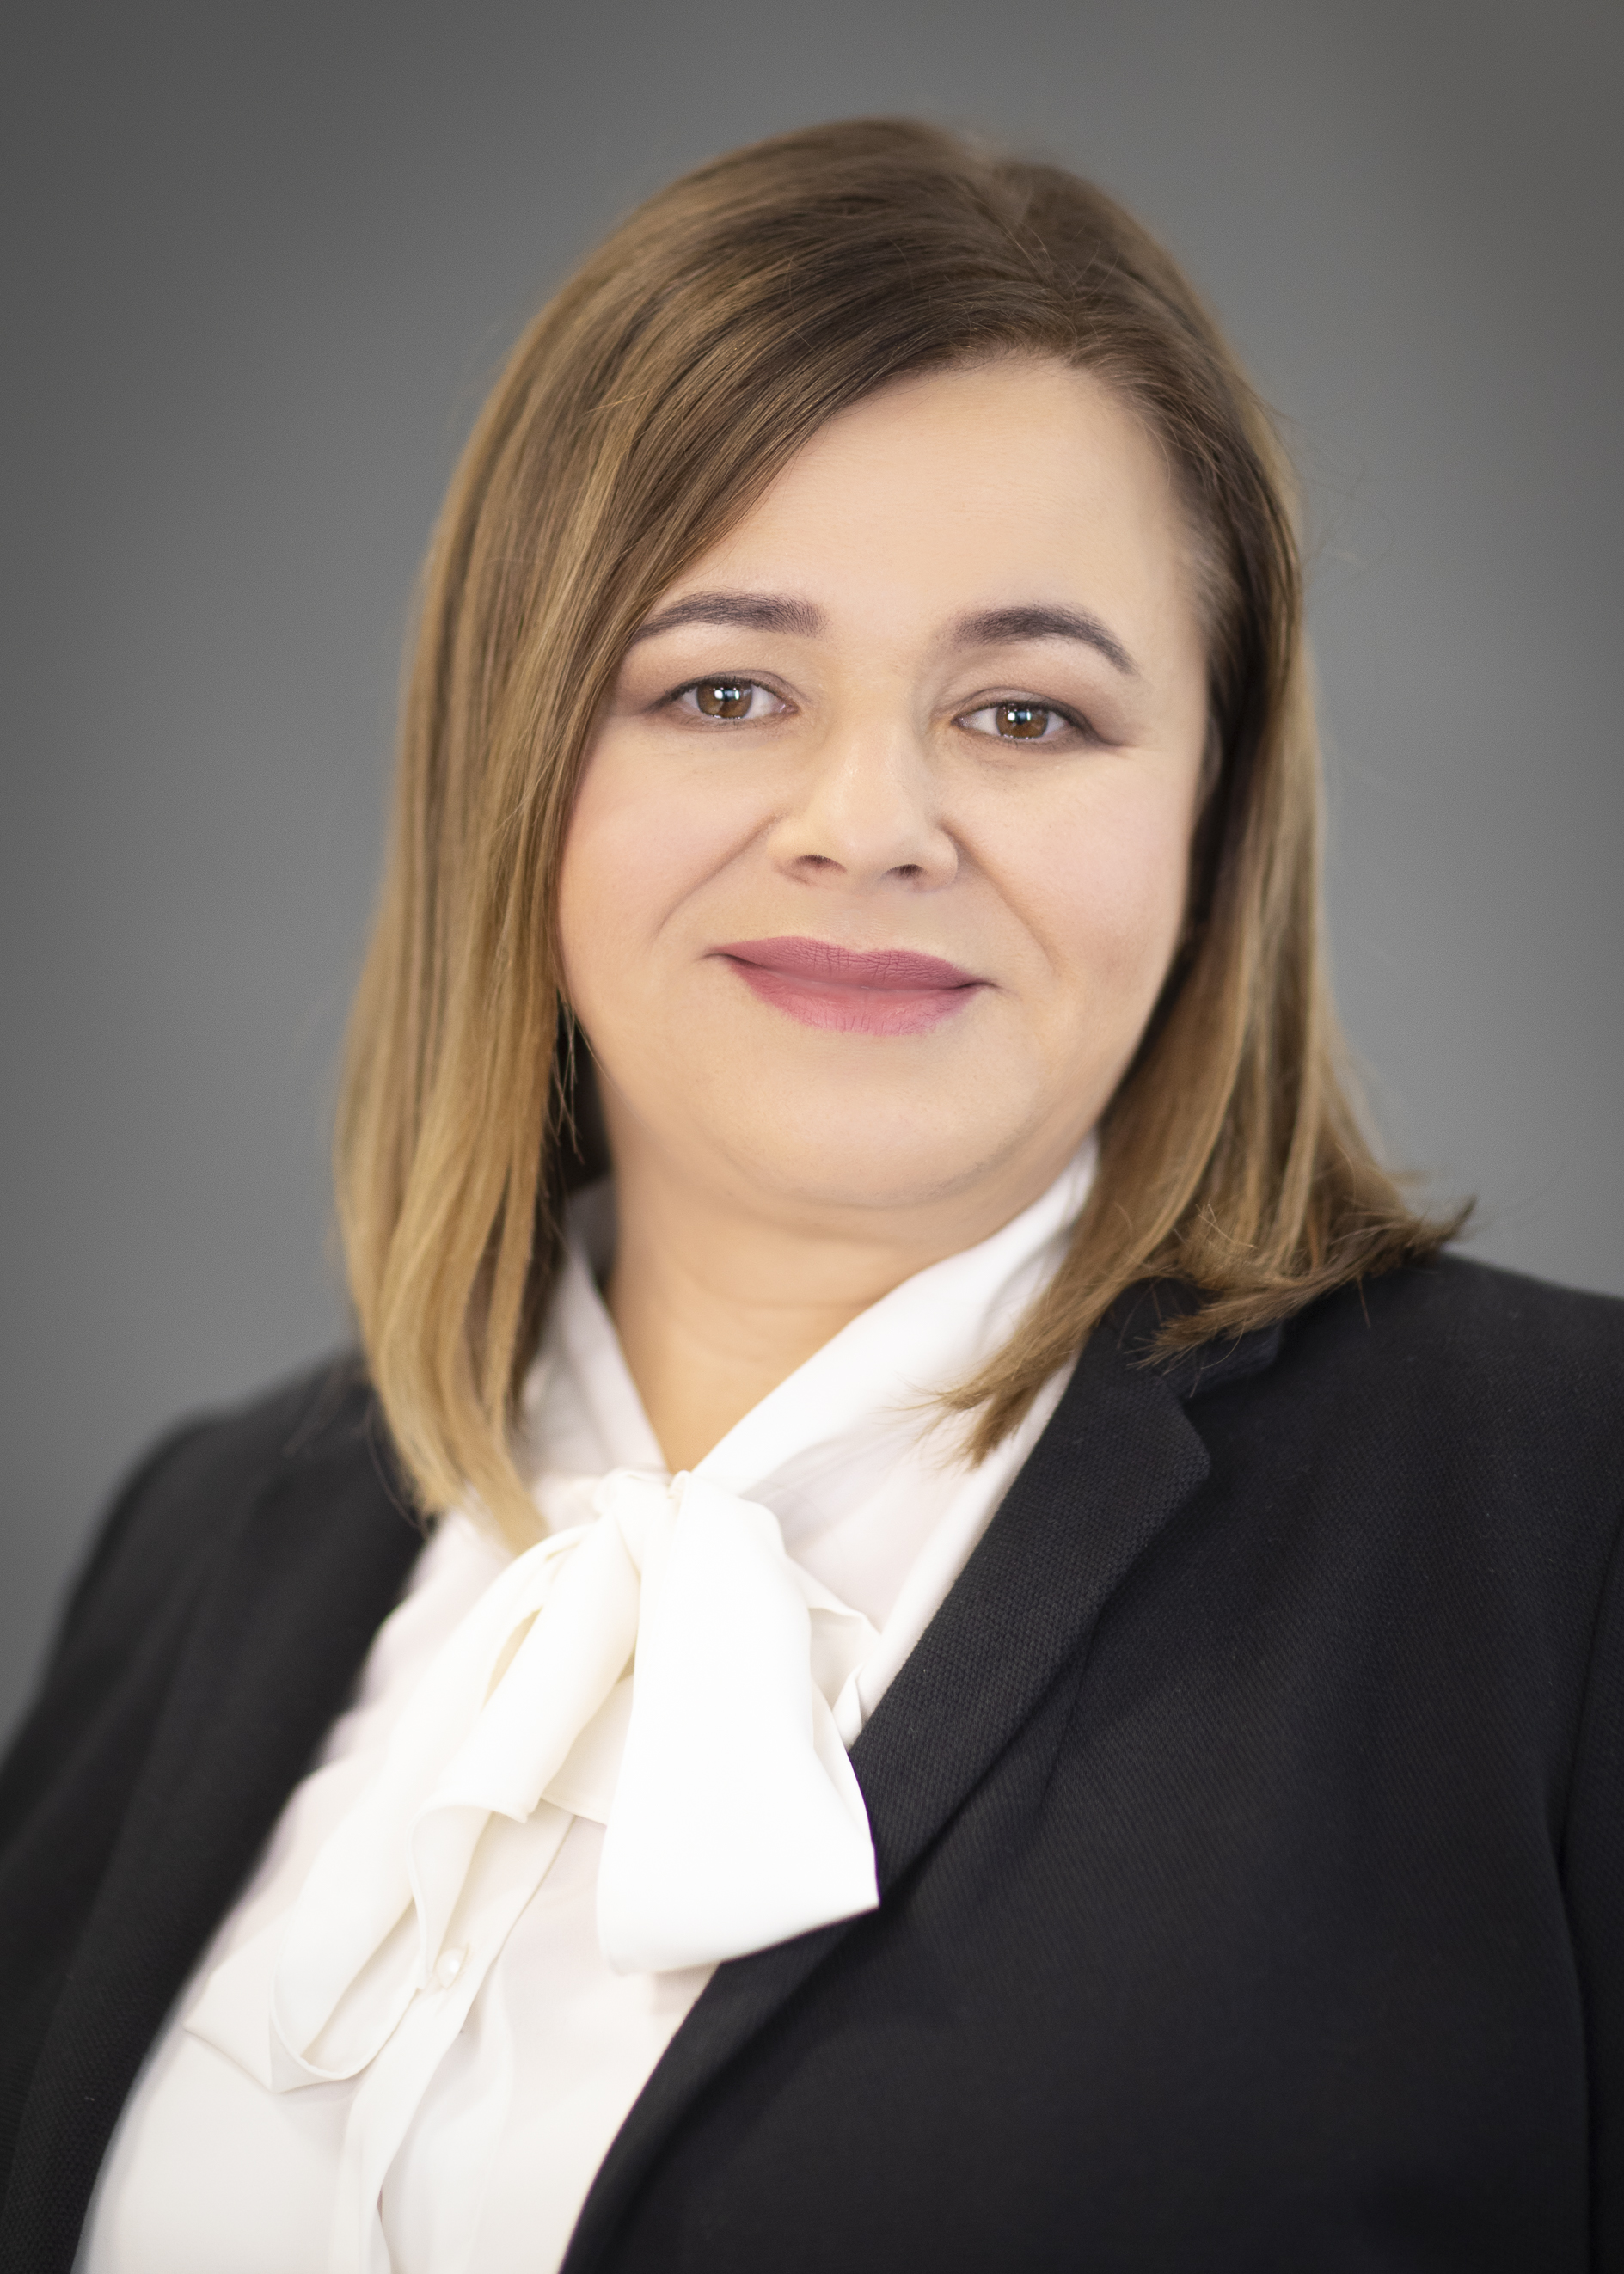 Małgorzata Romaniuk